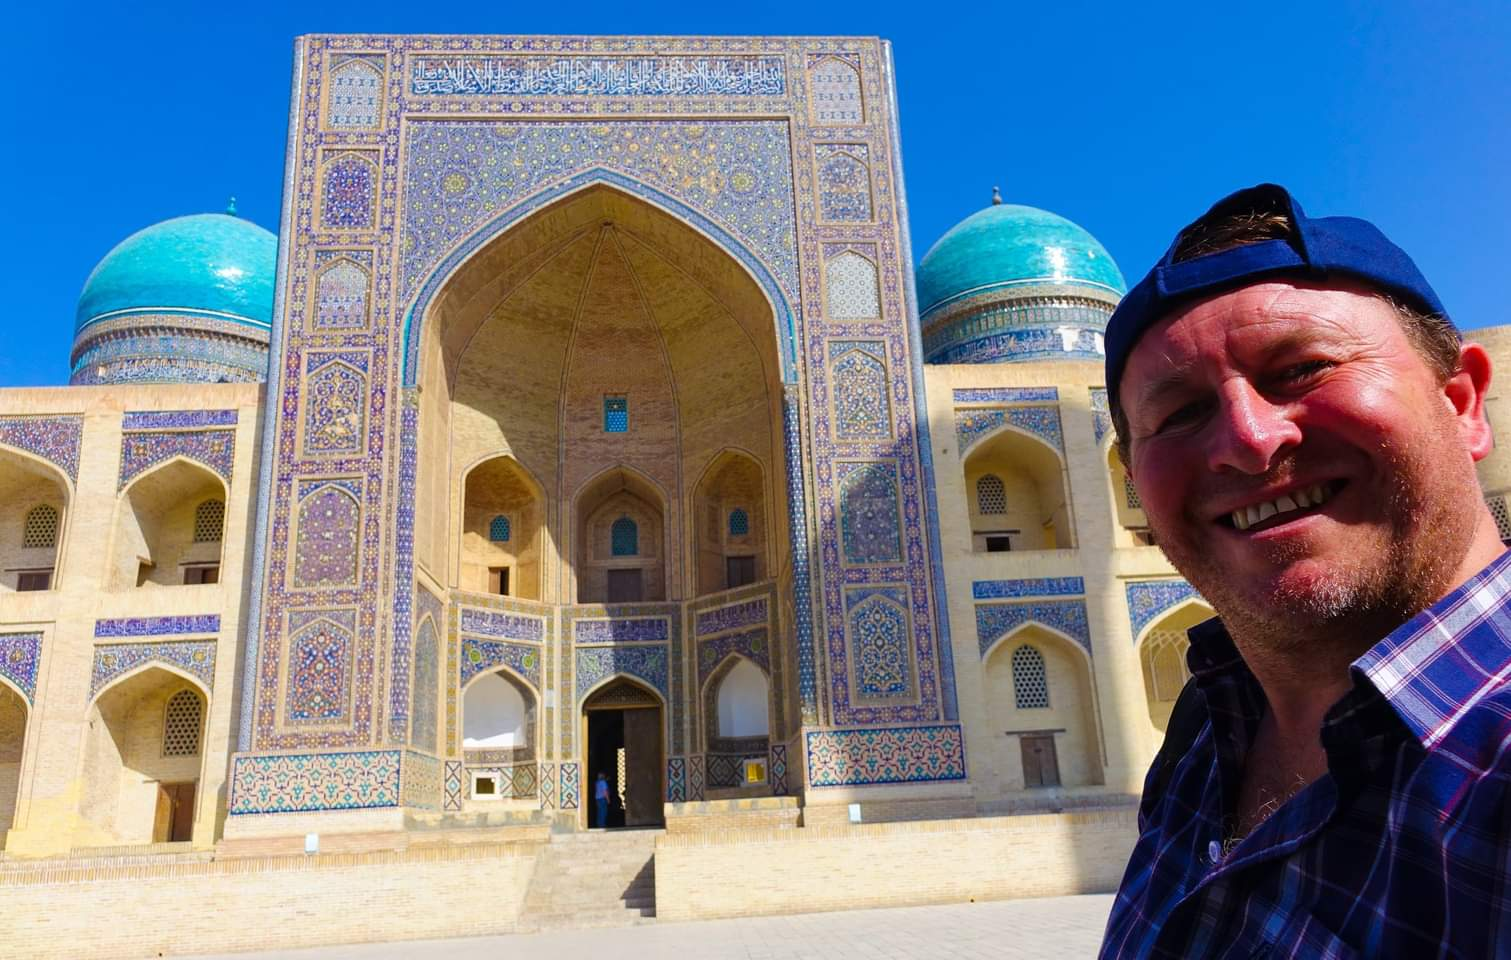 Bukhara, Uzbekistan. Endless Mosques, Madrassas, Bazaars and Caravanserais